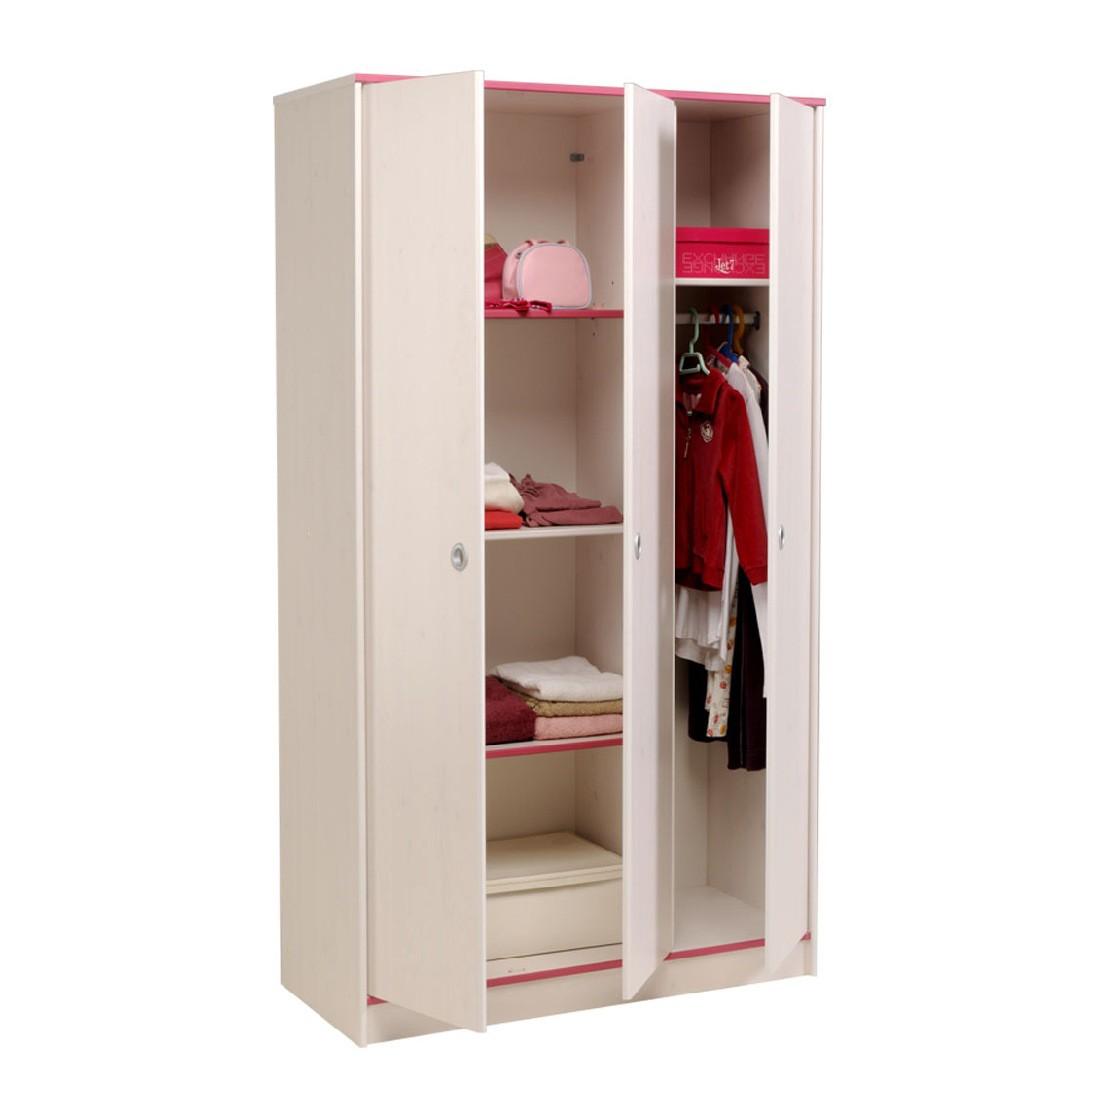 Kleiderschrank Smoozy (Rosa oder Blau) – Drehbare Kanten – Weiß lackiert – 2-türig, Parisot Meubles bestellen